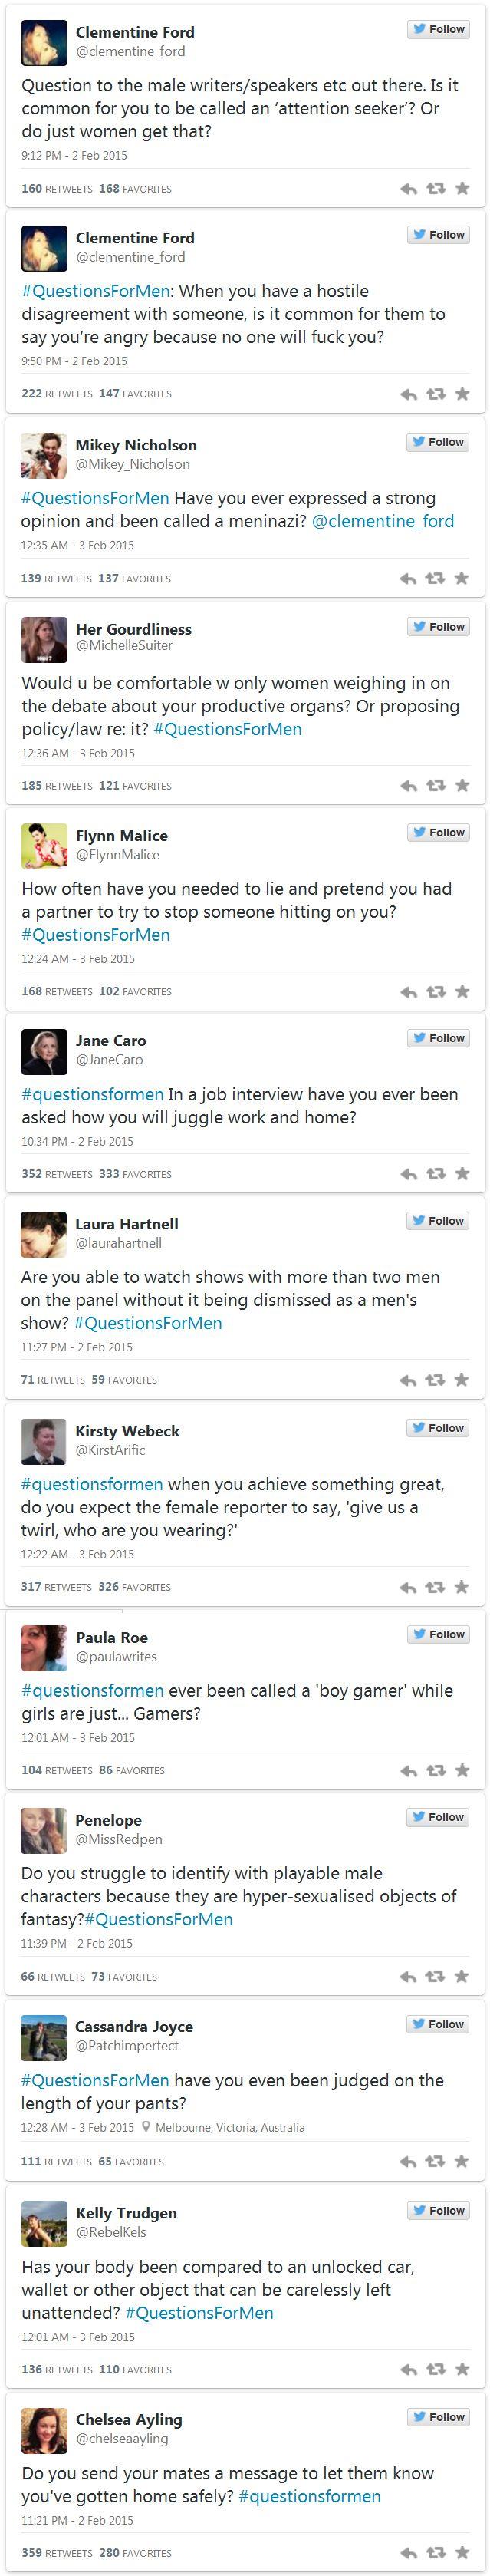 Questions for Men